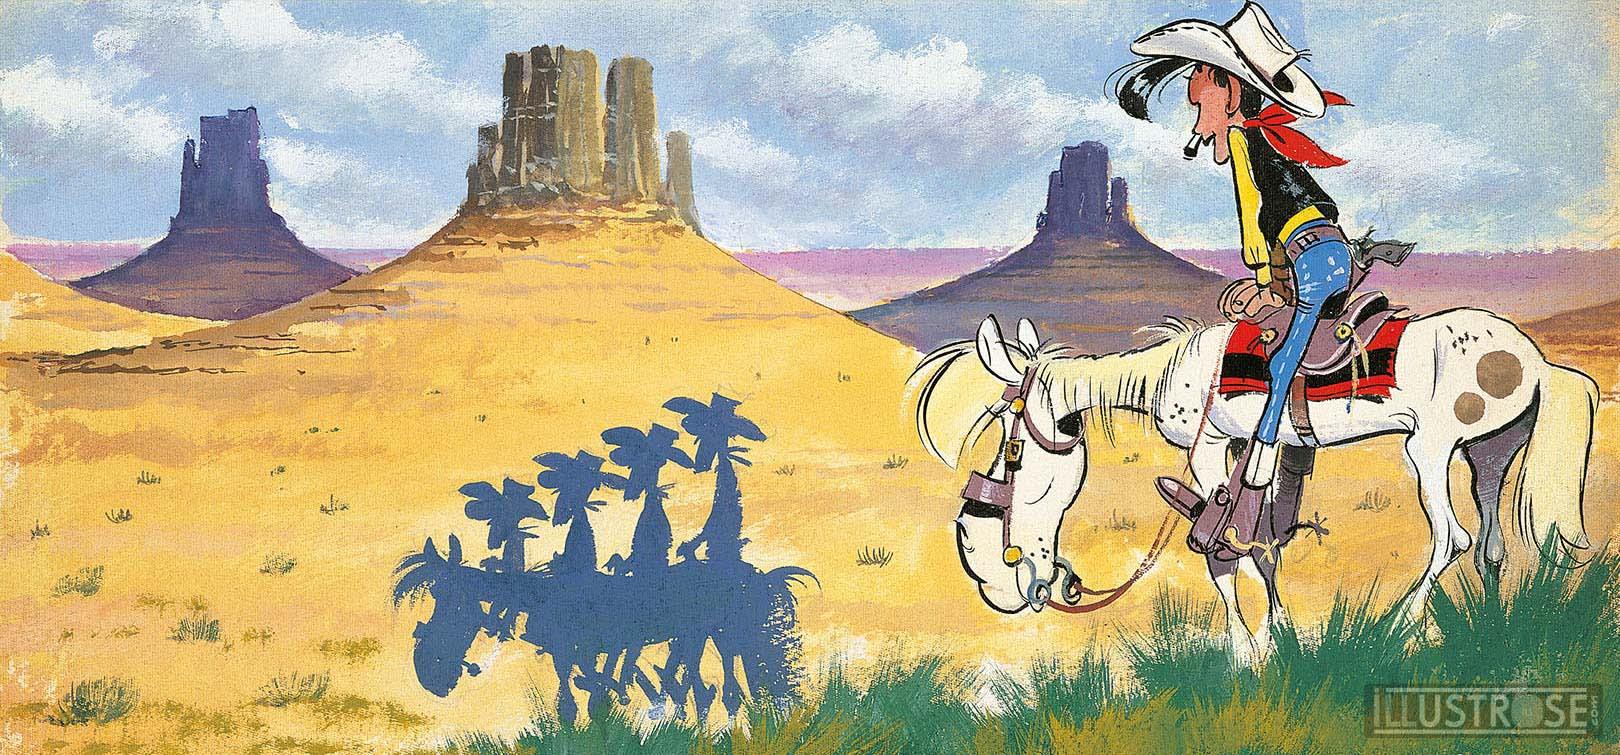 Toile BD décorative Lucky Luke de Morris 'Canyon' - Illustrose